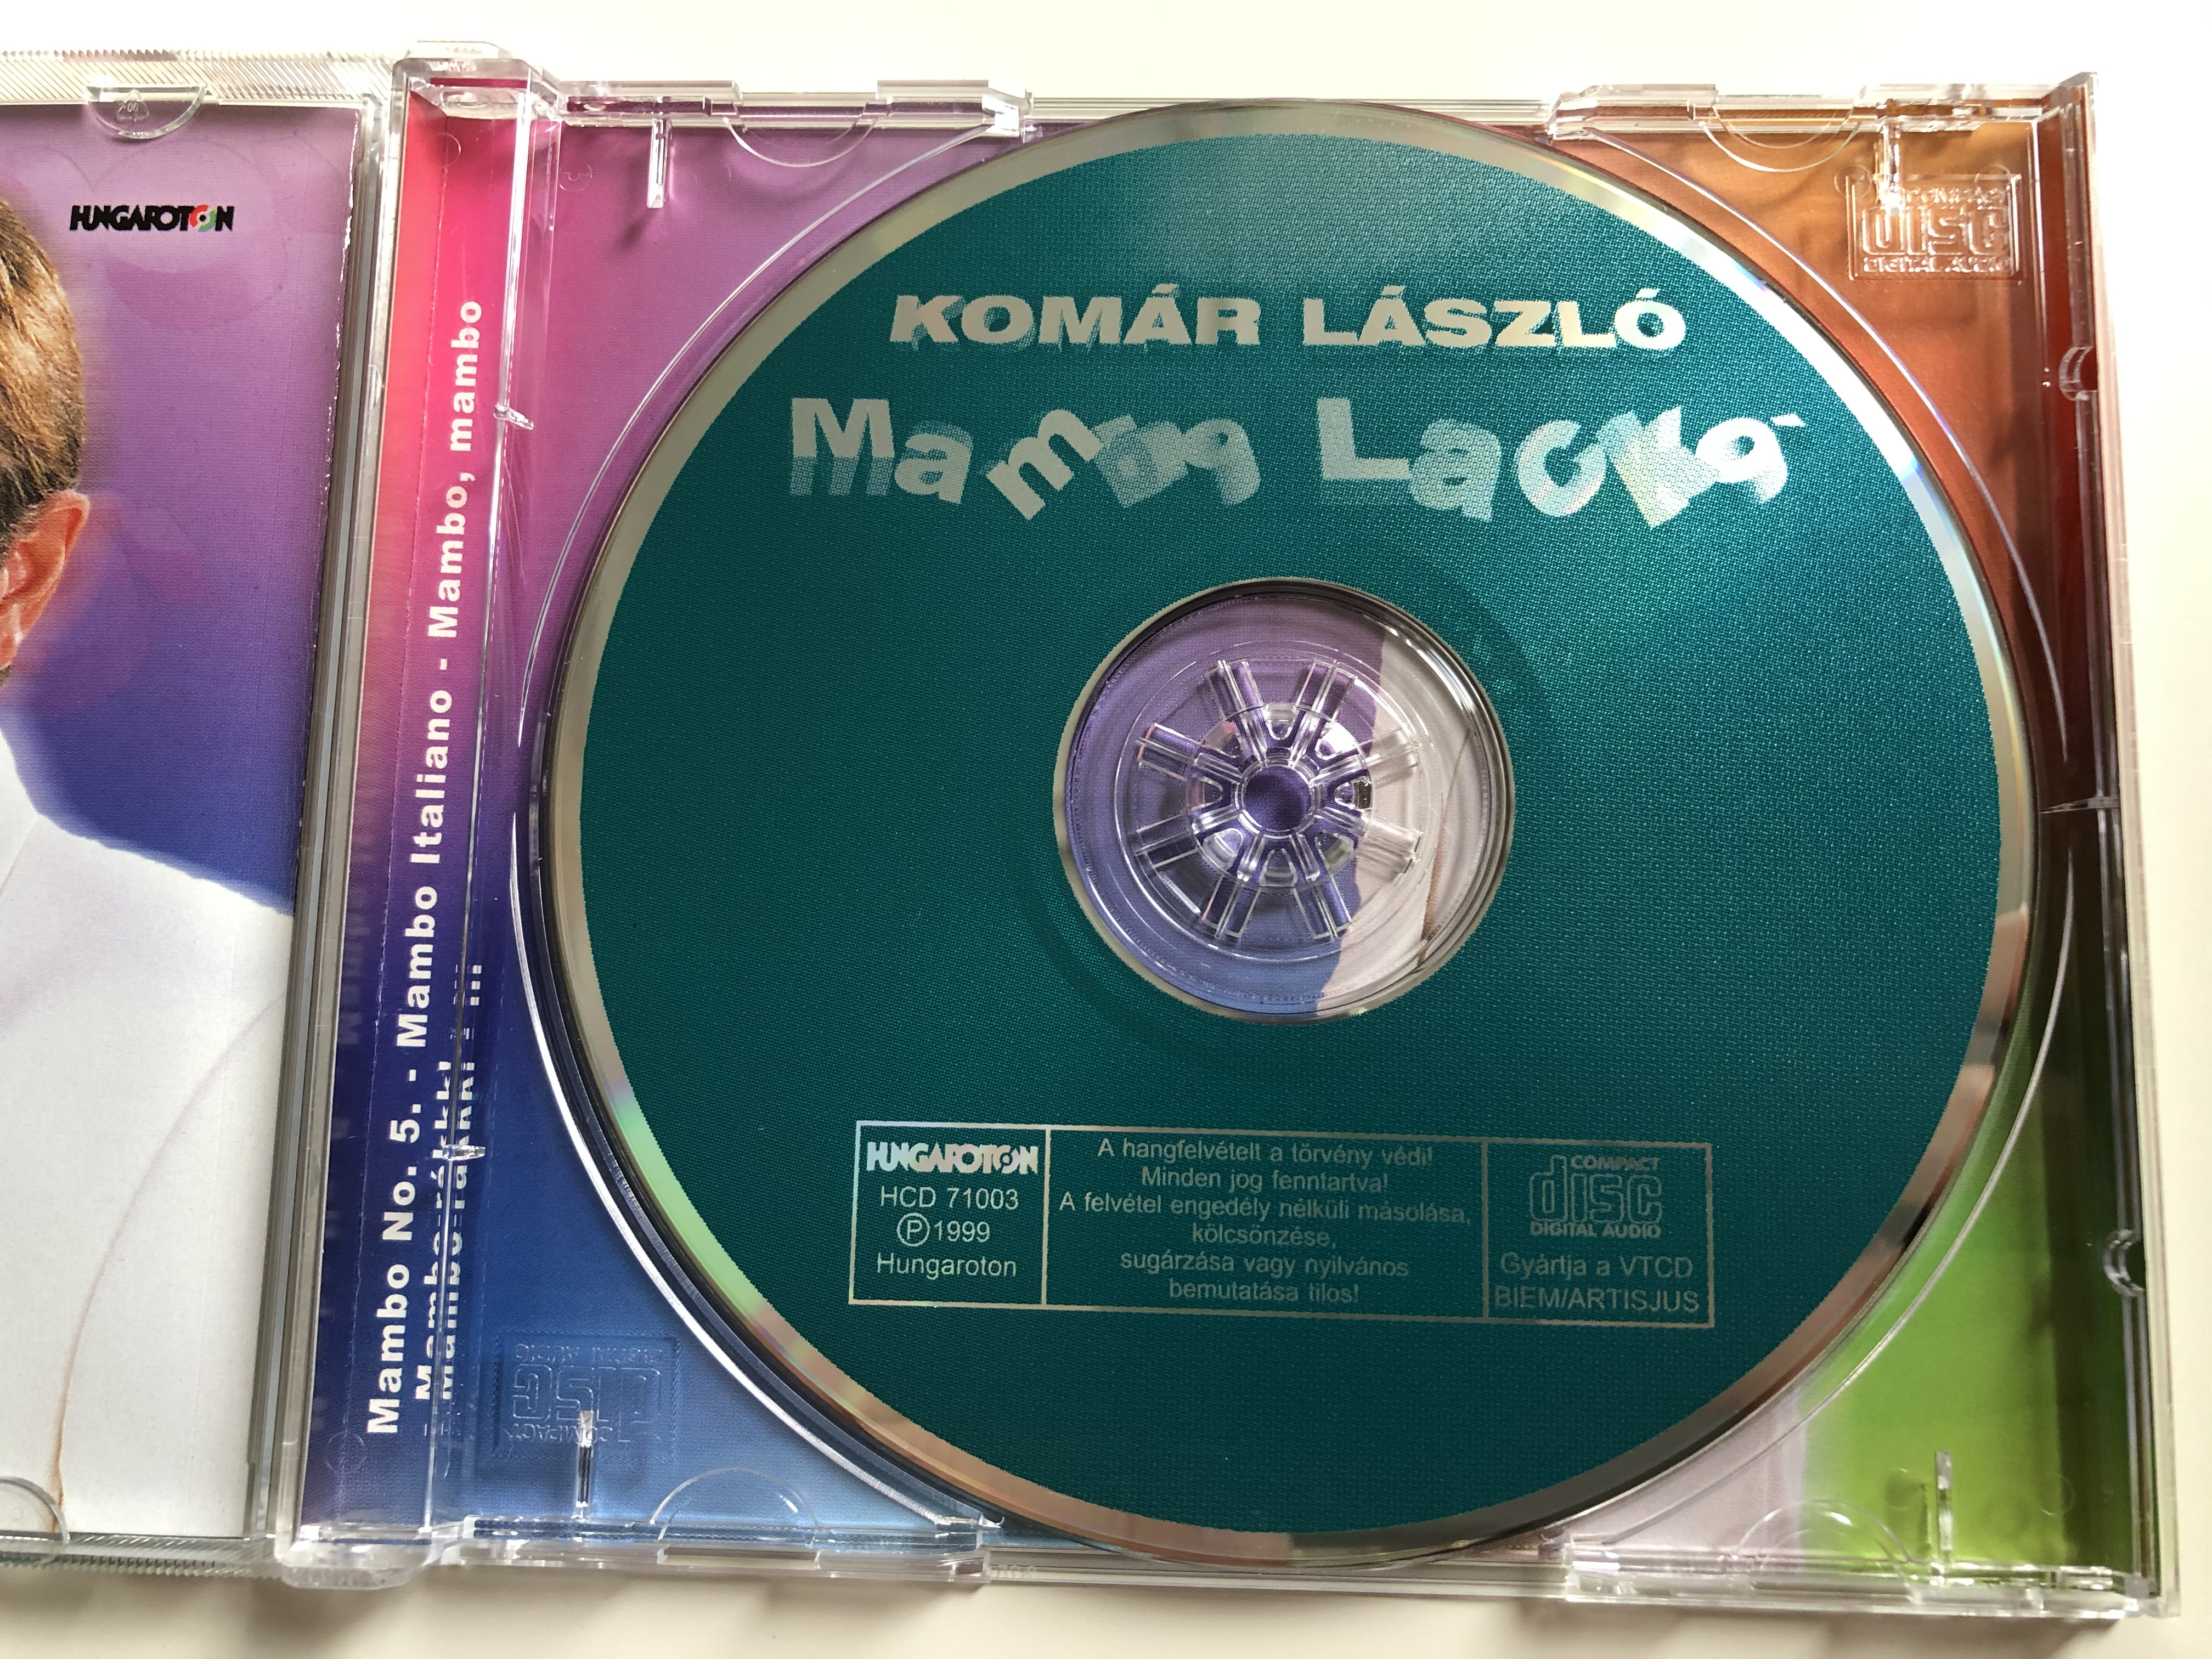 kom-r-l-szl-mambo-lack-hungaroton-audio-cd-1999-hcd-71003-4-.jpg